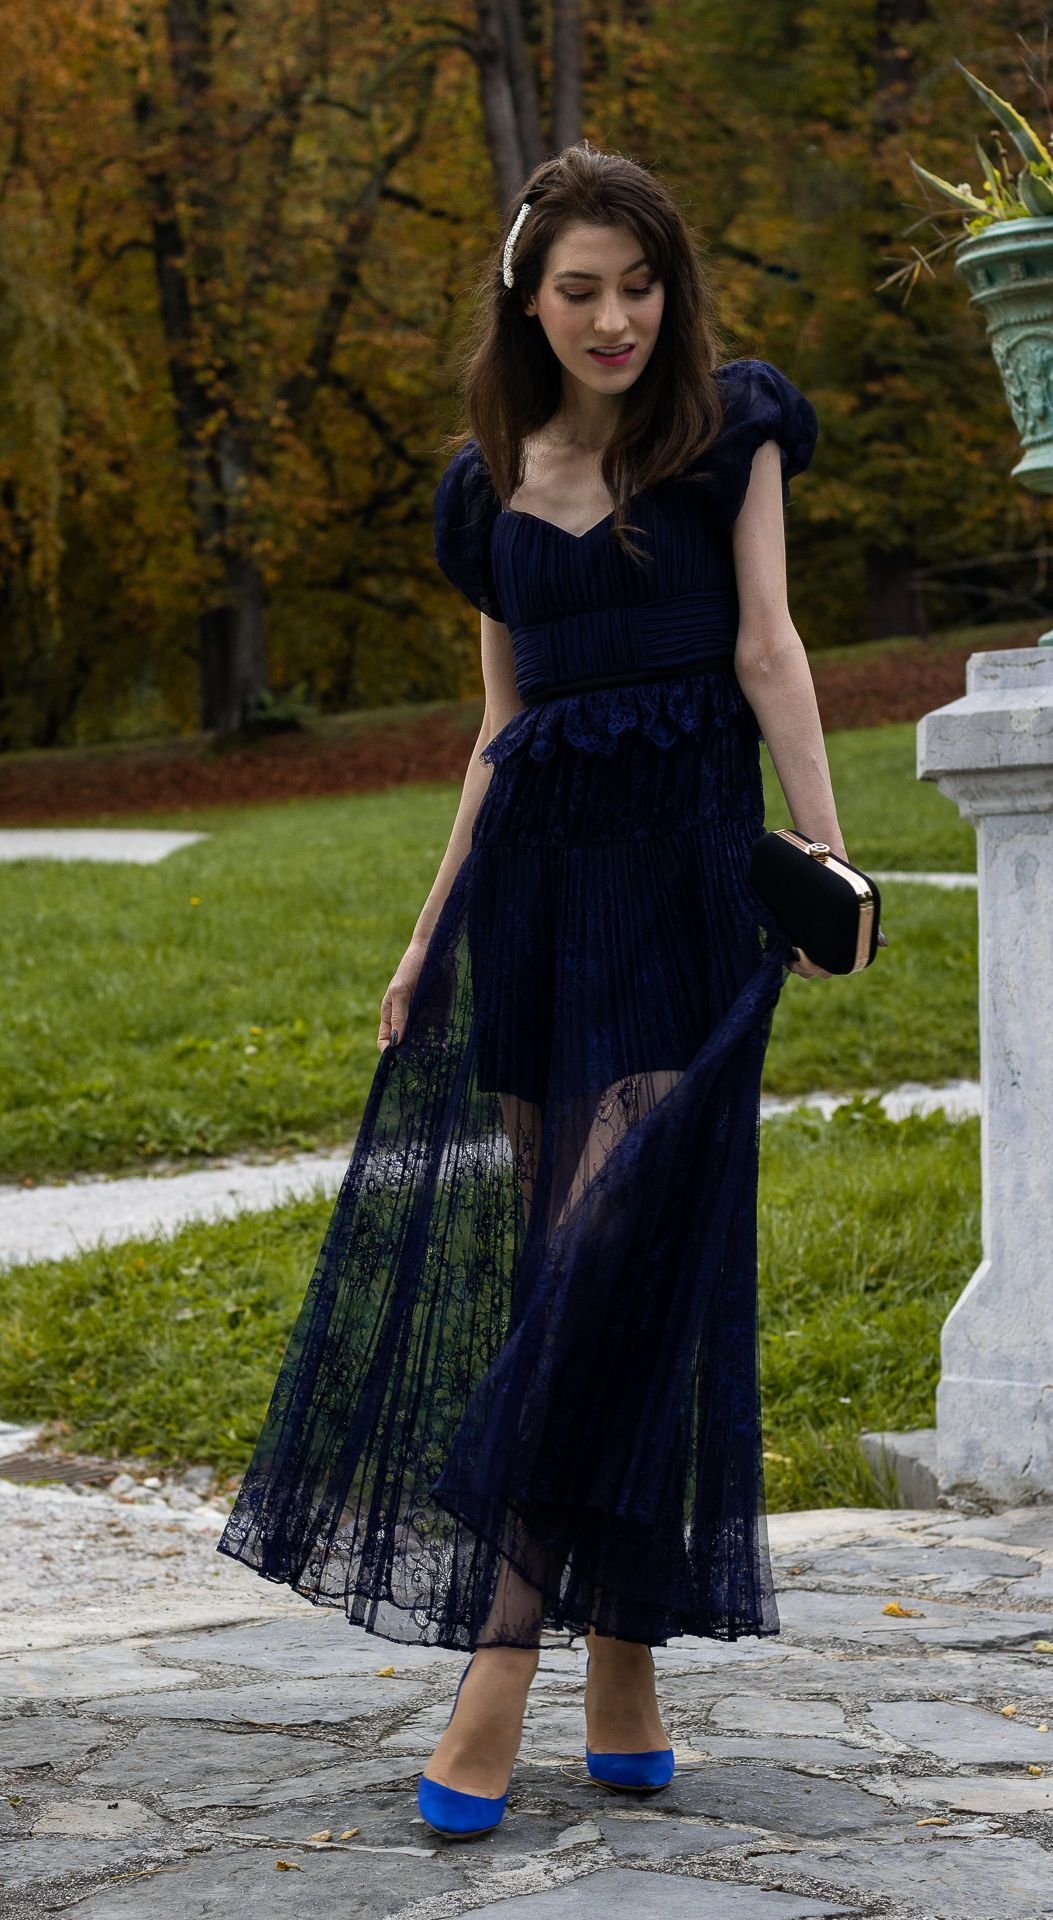 Black-tie wedding guest dress for Fall Wedding   Brunette from Wall Street #weddingguestdress